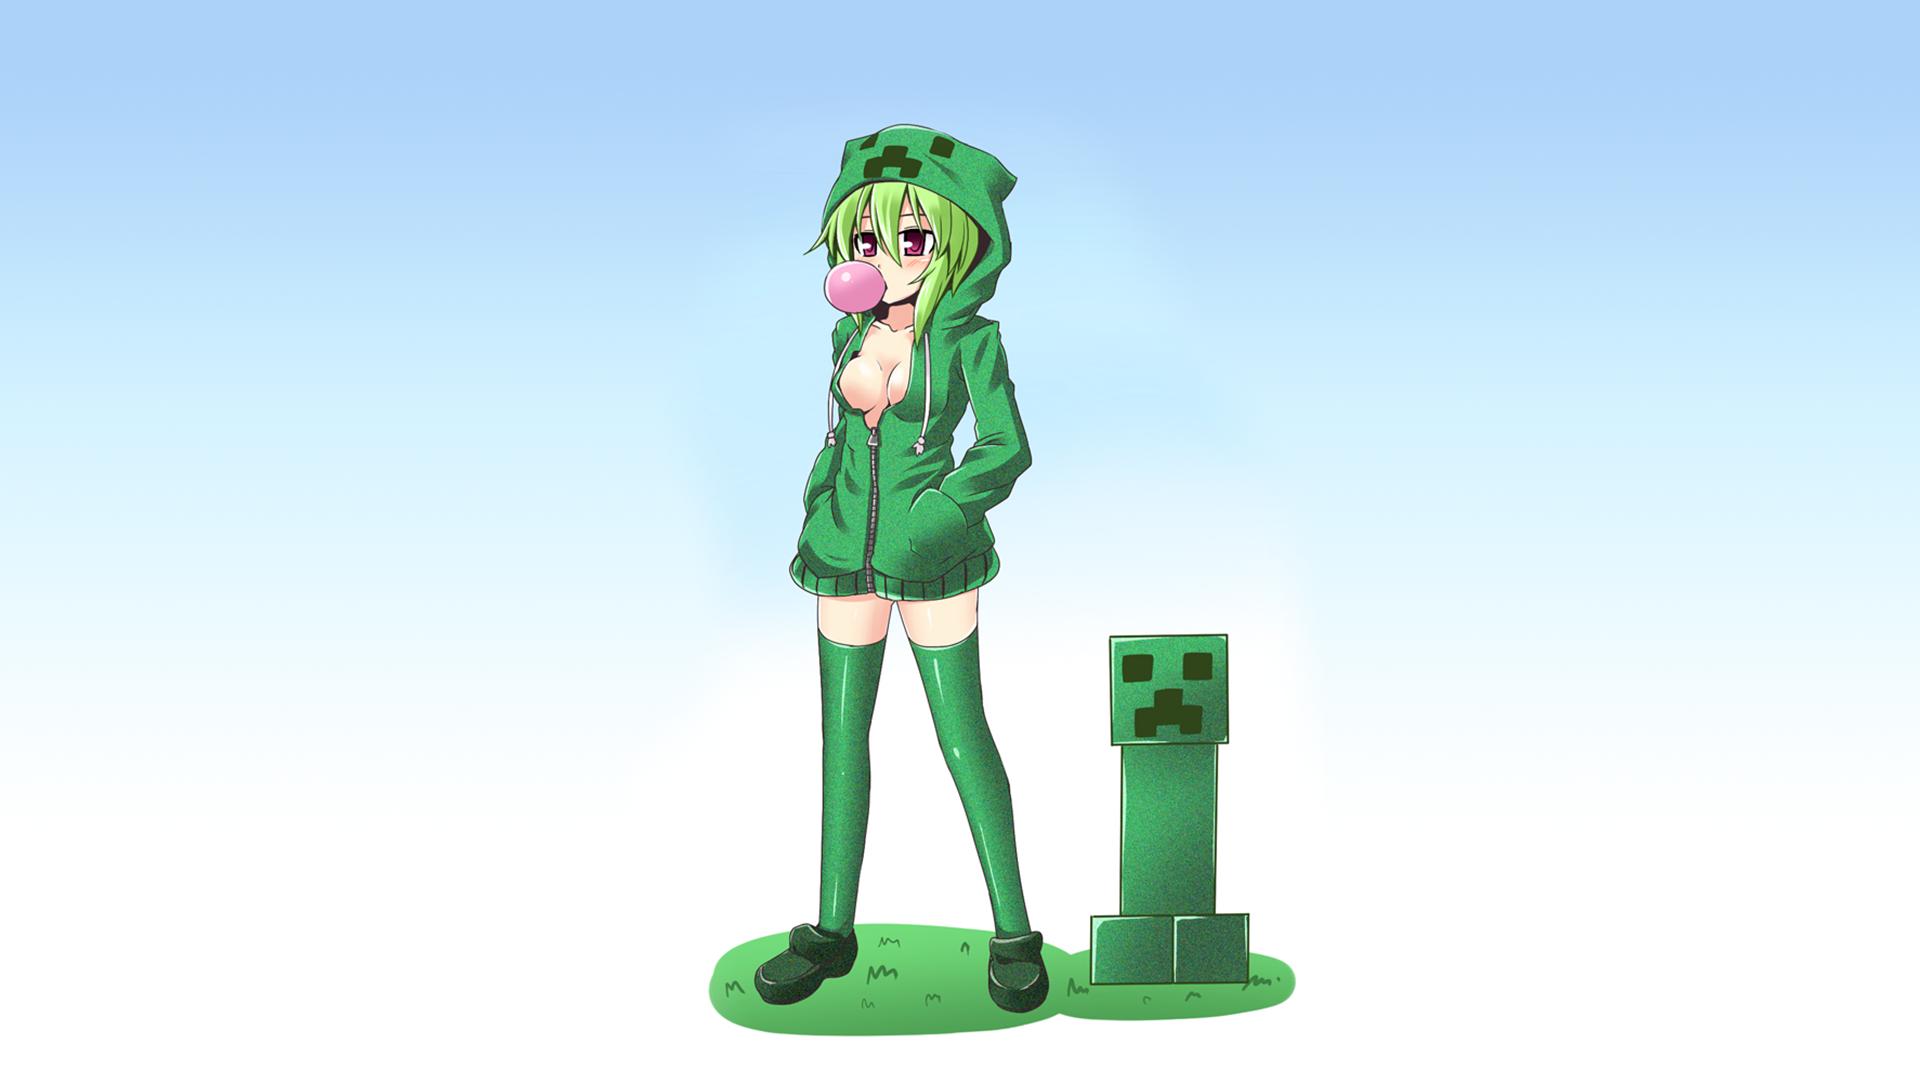 Fond Décran Minecraft Liane Filles Anime Anime